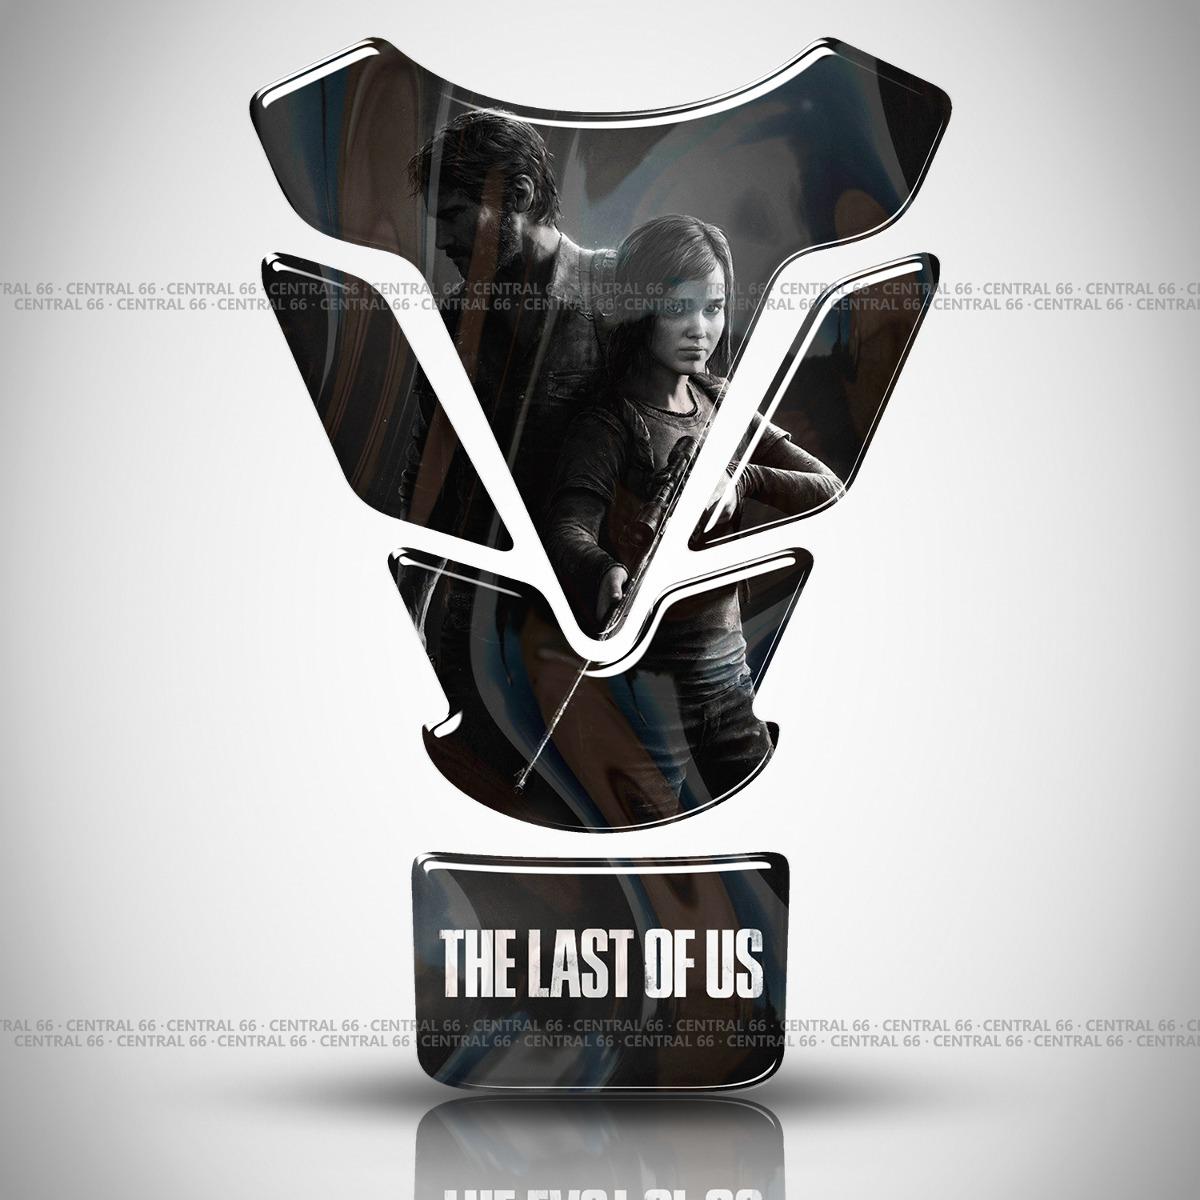 The last of us xx